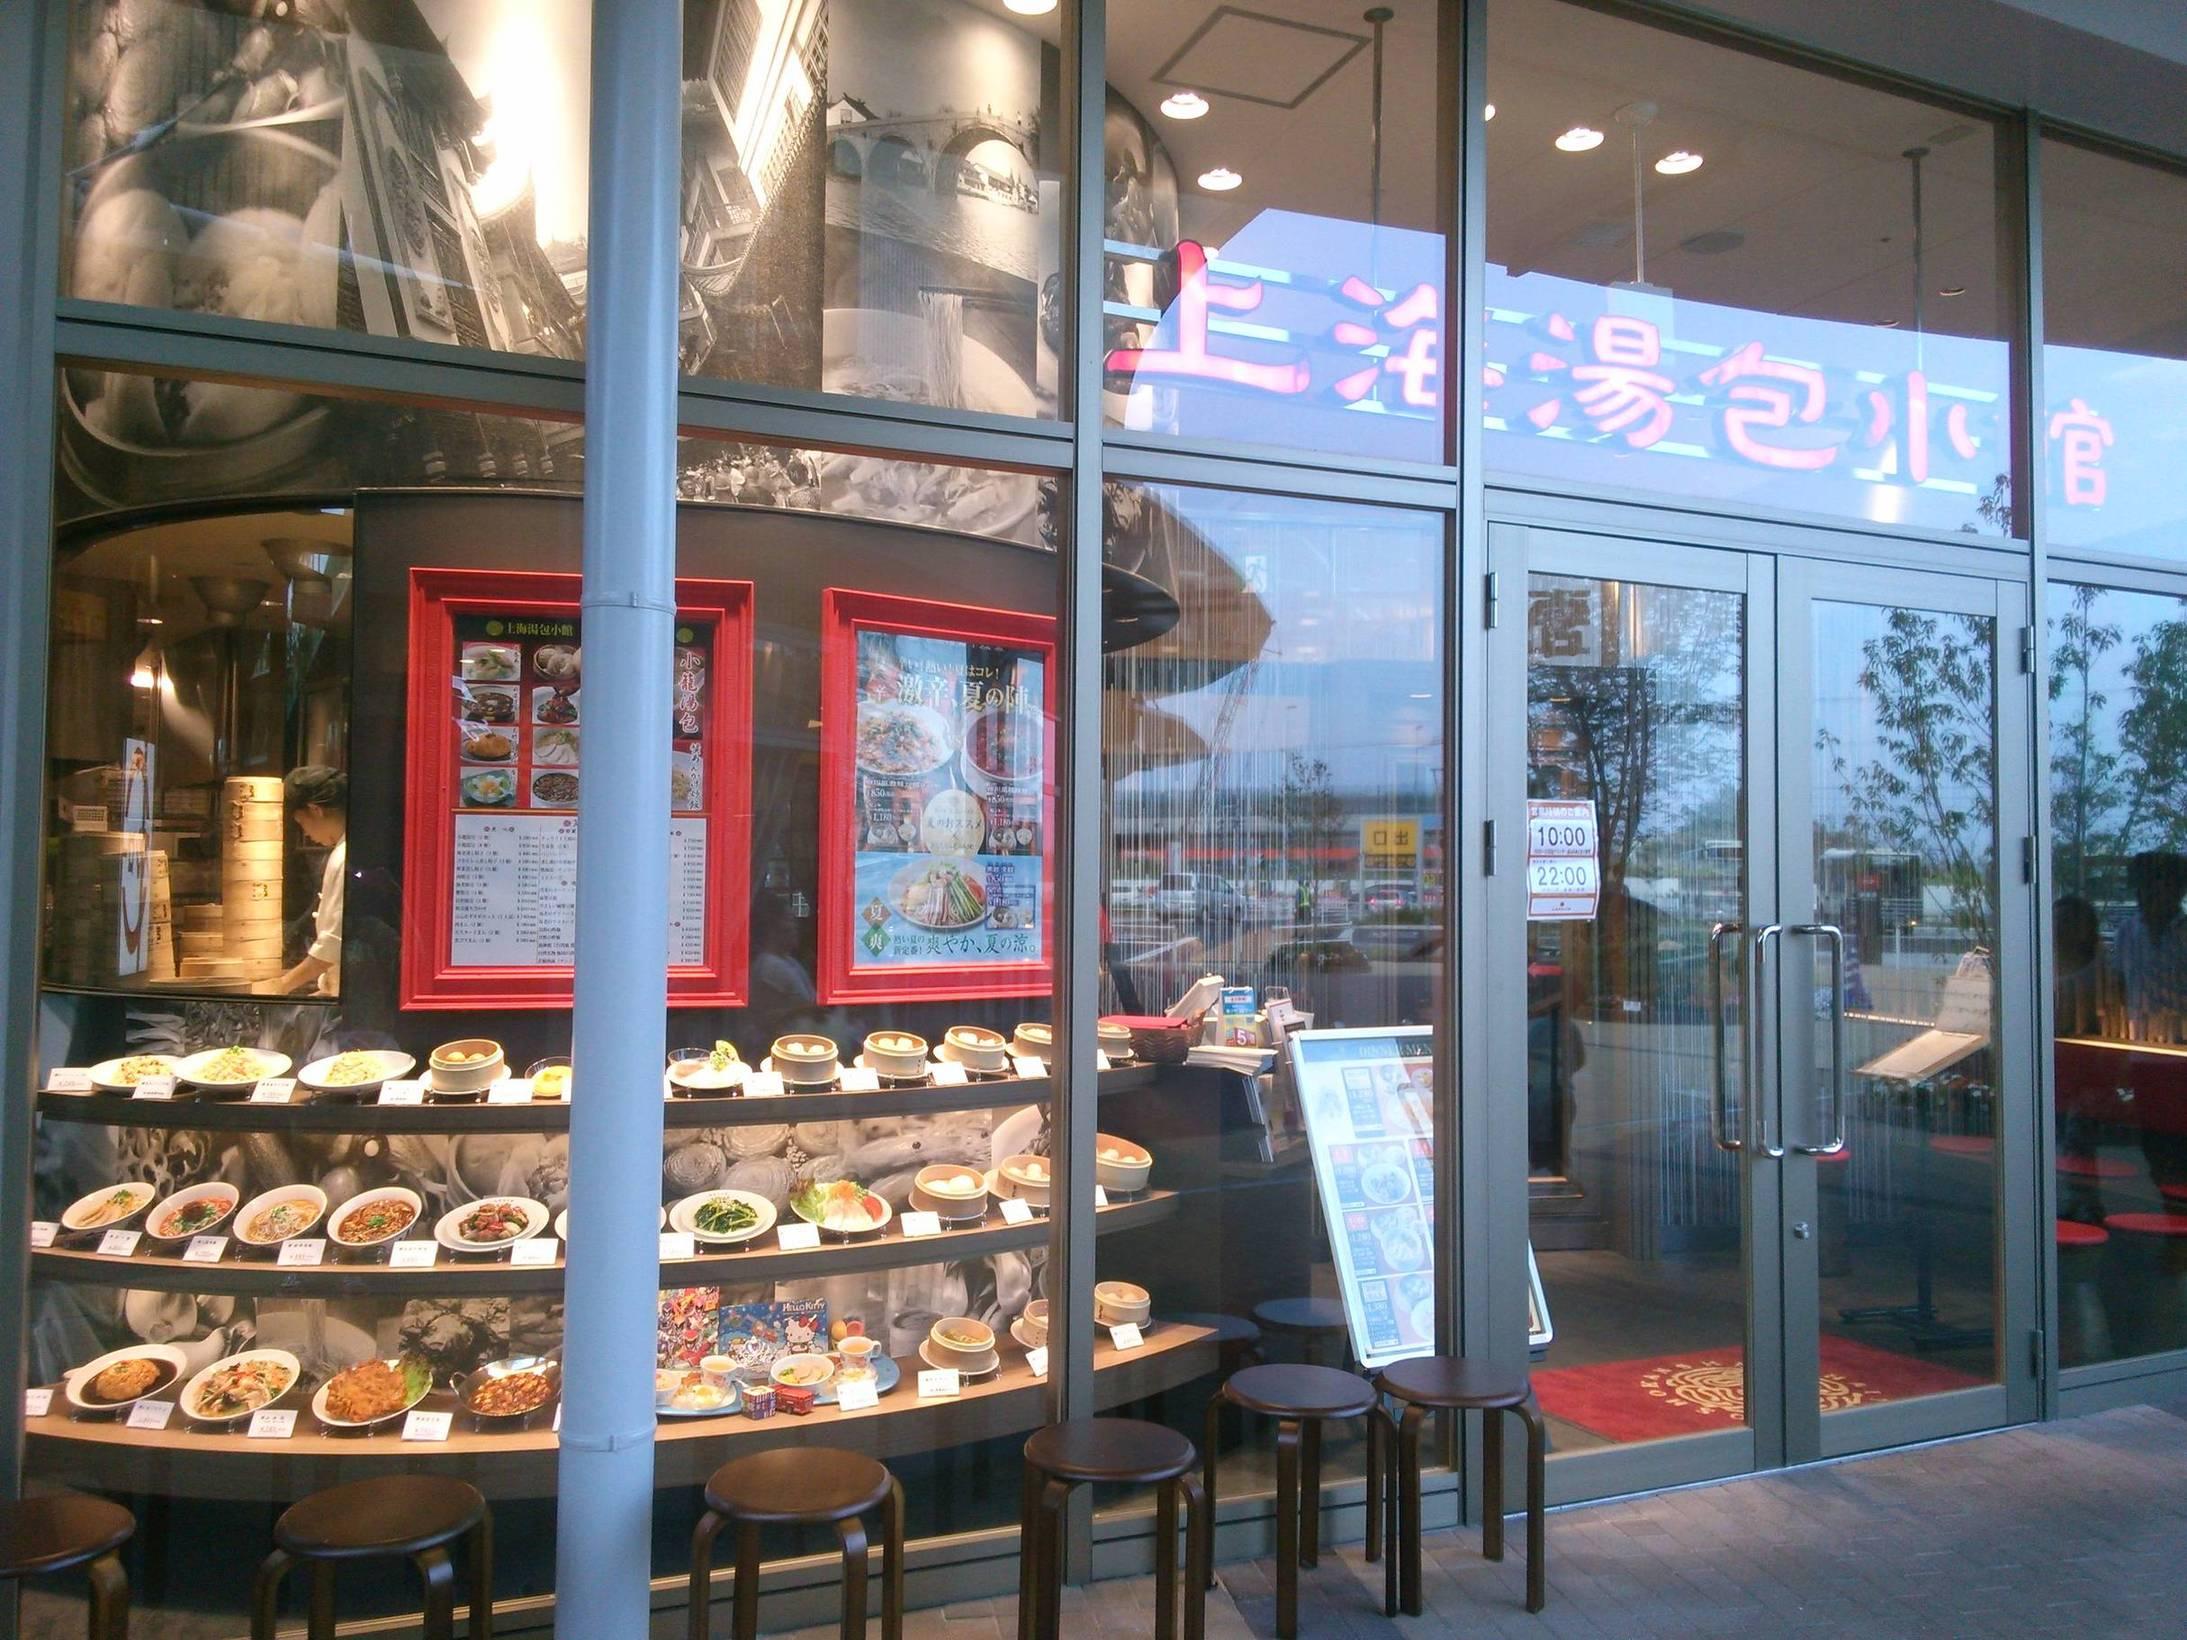 上海湯包小館 イオンモール名古屋茶屋店